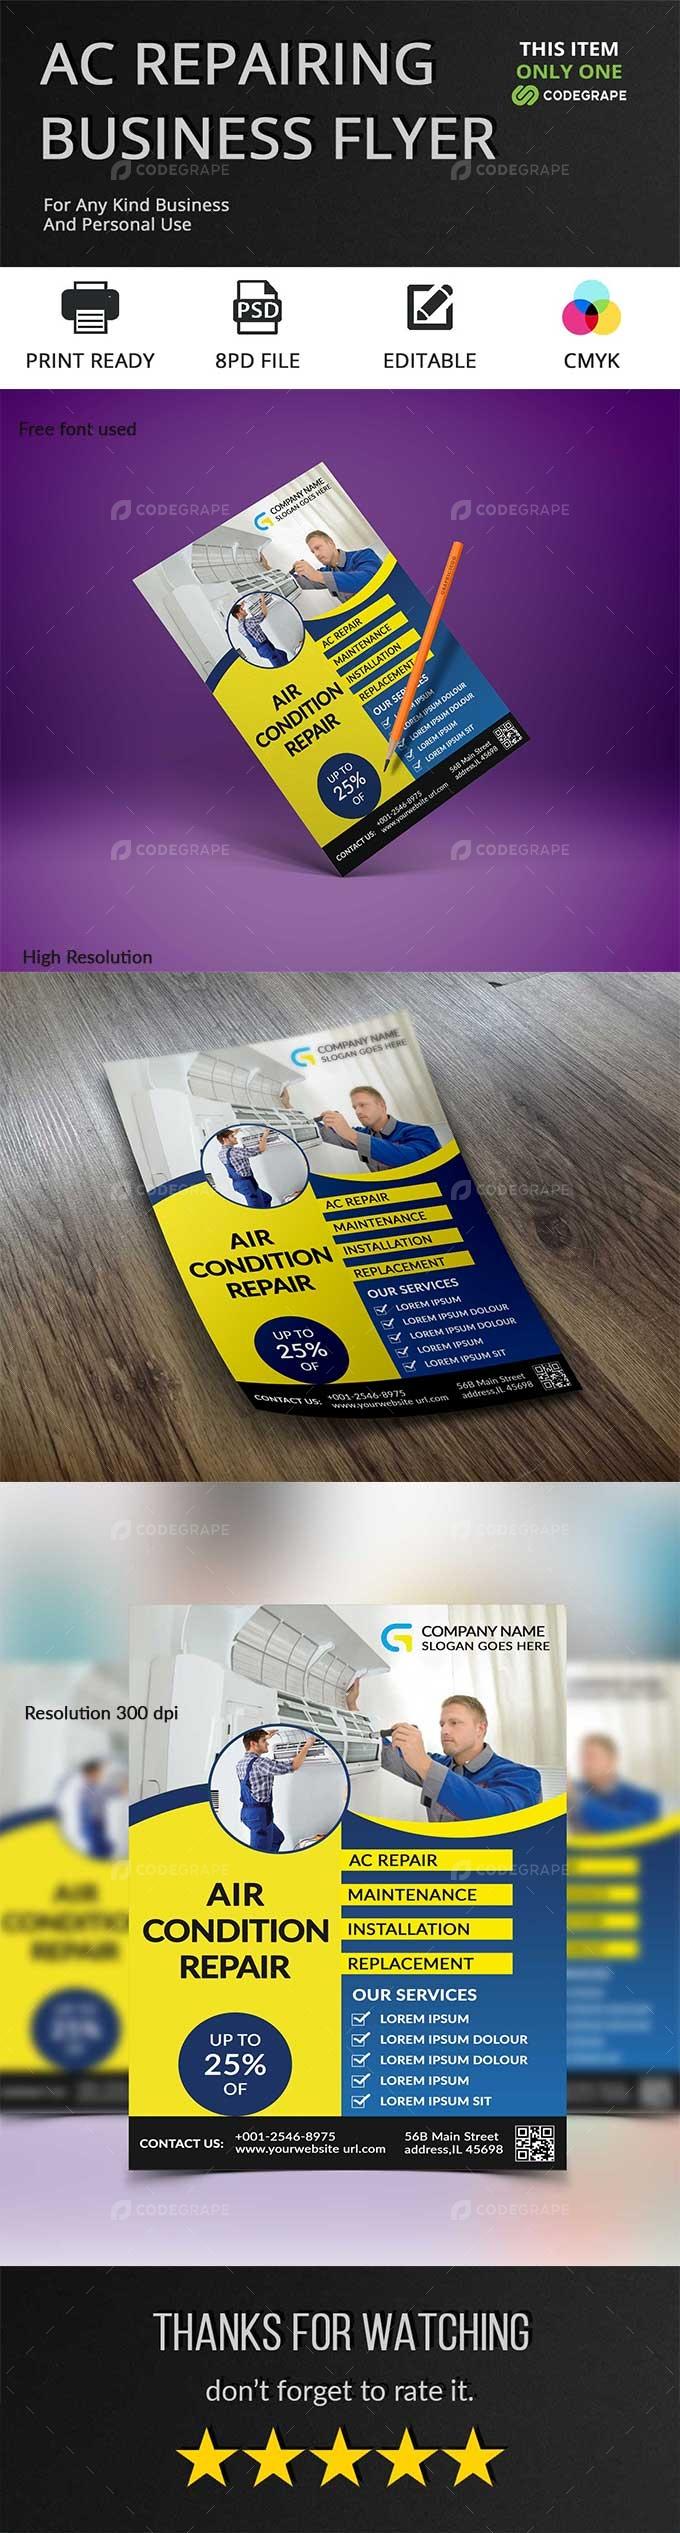 Repairing Business Flyer